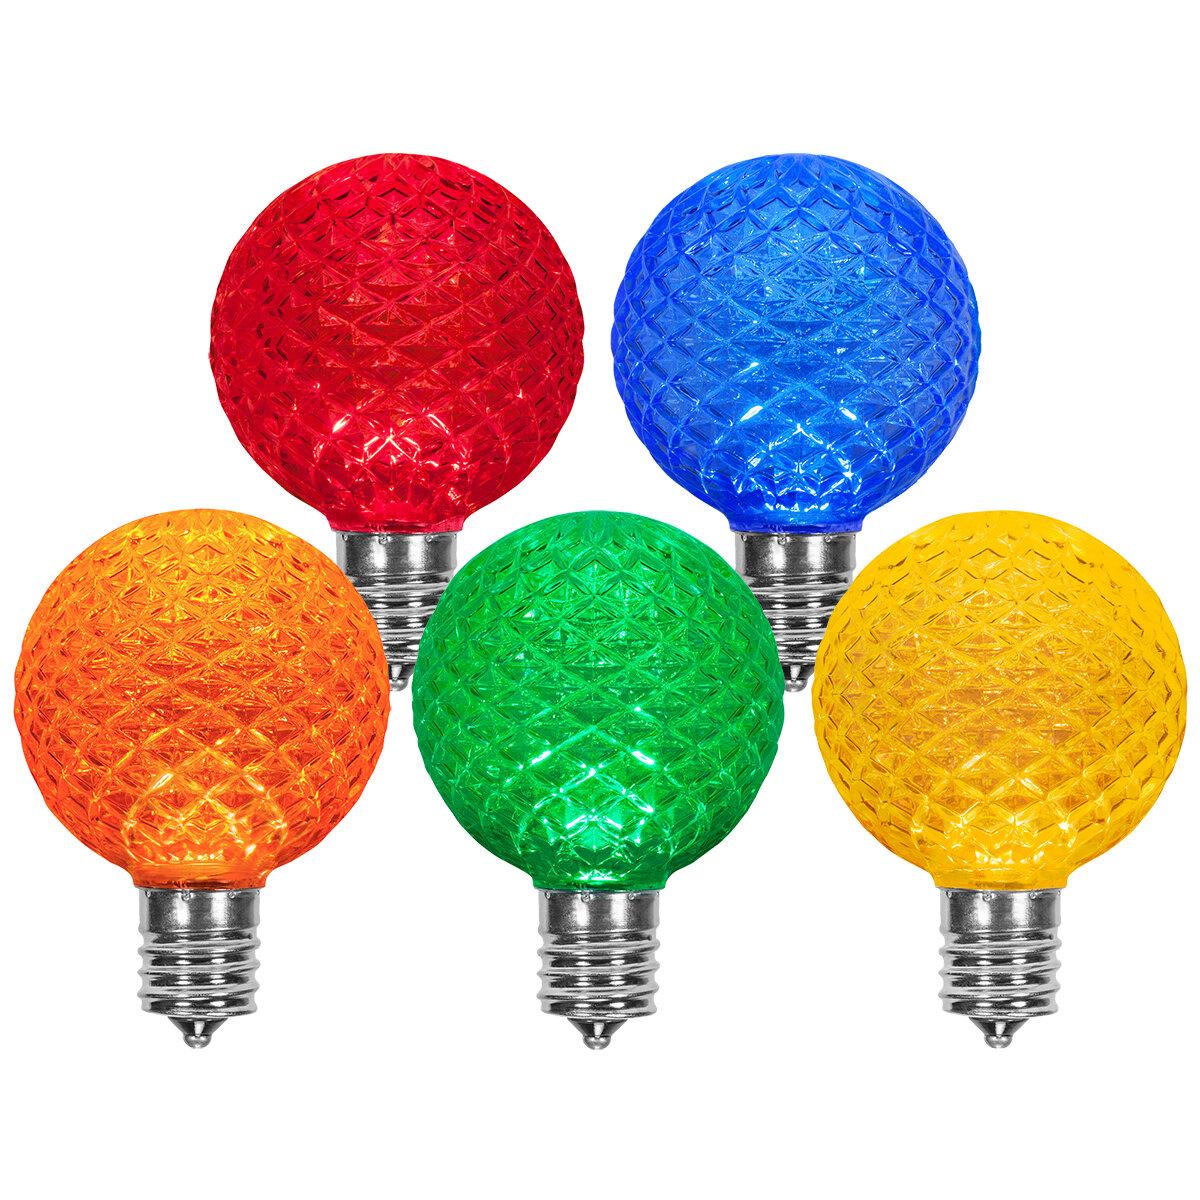 Wintergreen Lighting 25 Watt Equivalent Multicolor 130 Volt Light Bulbs Wayfair